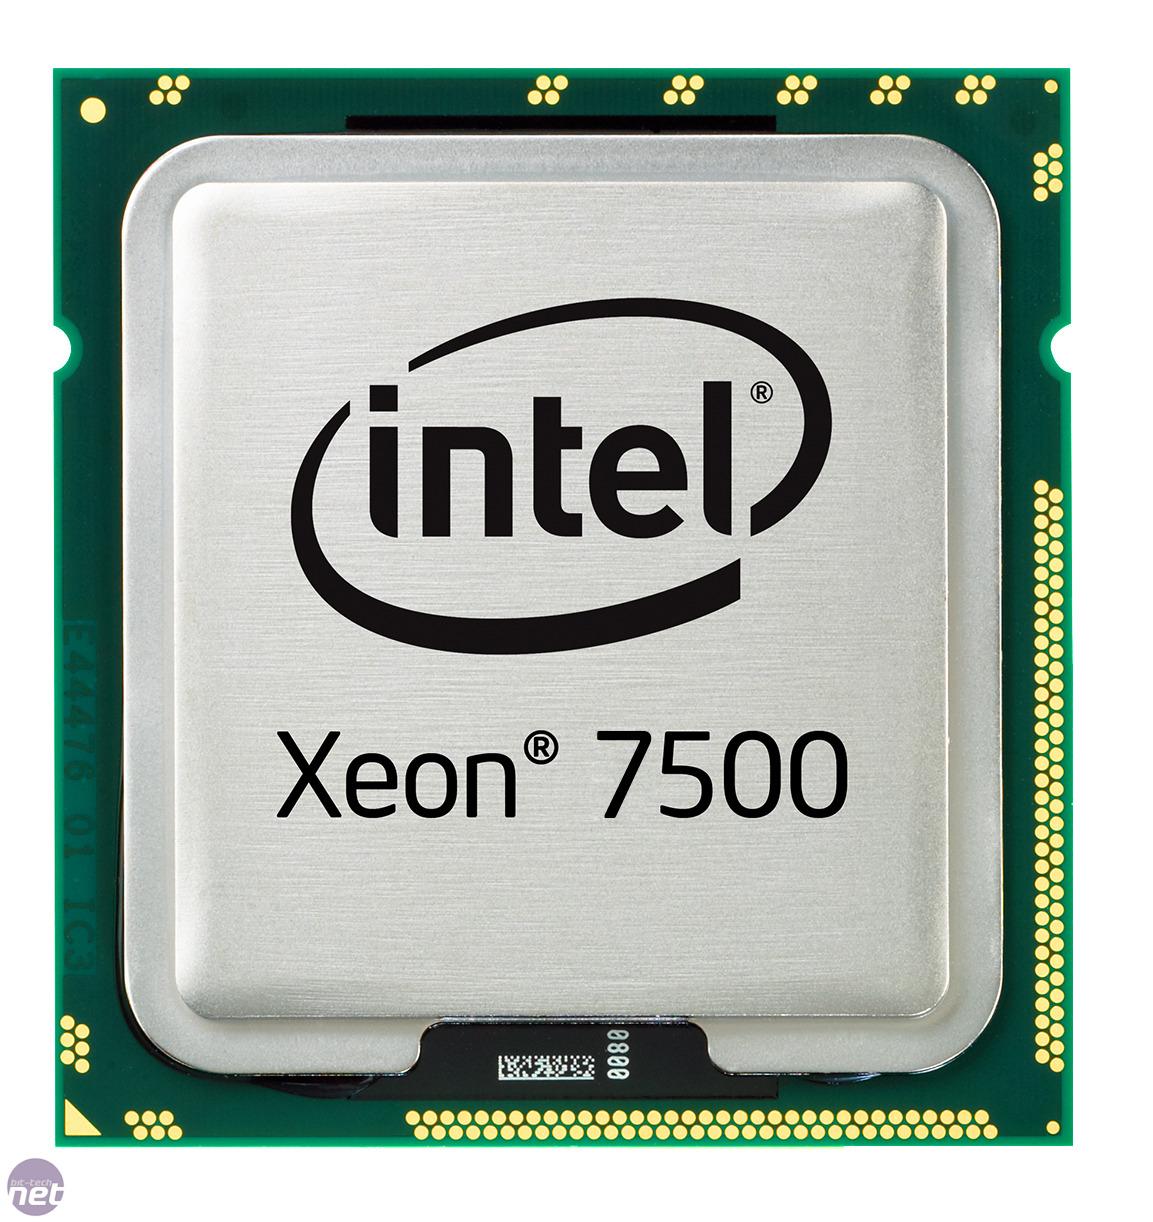 Intel xeon processor reviews - 5